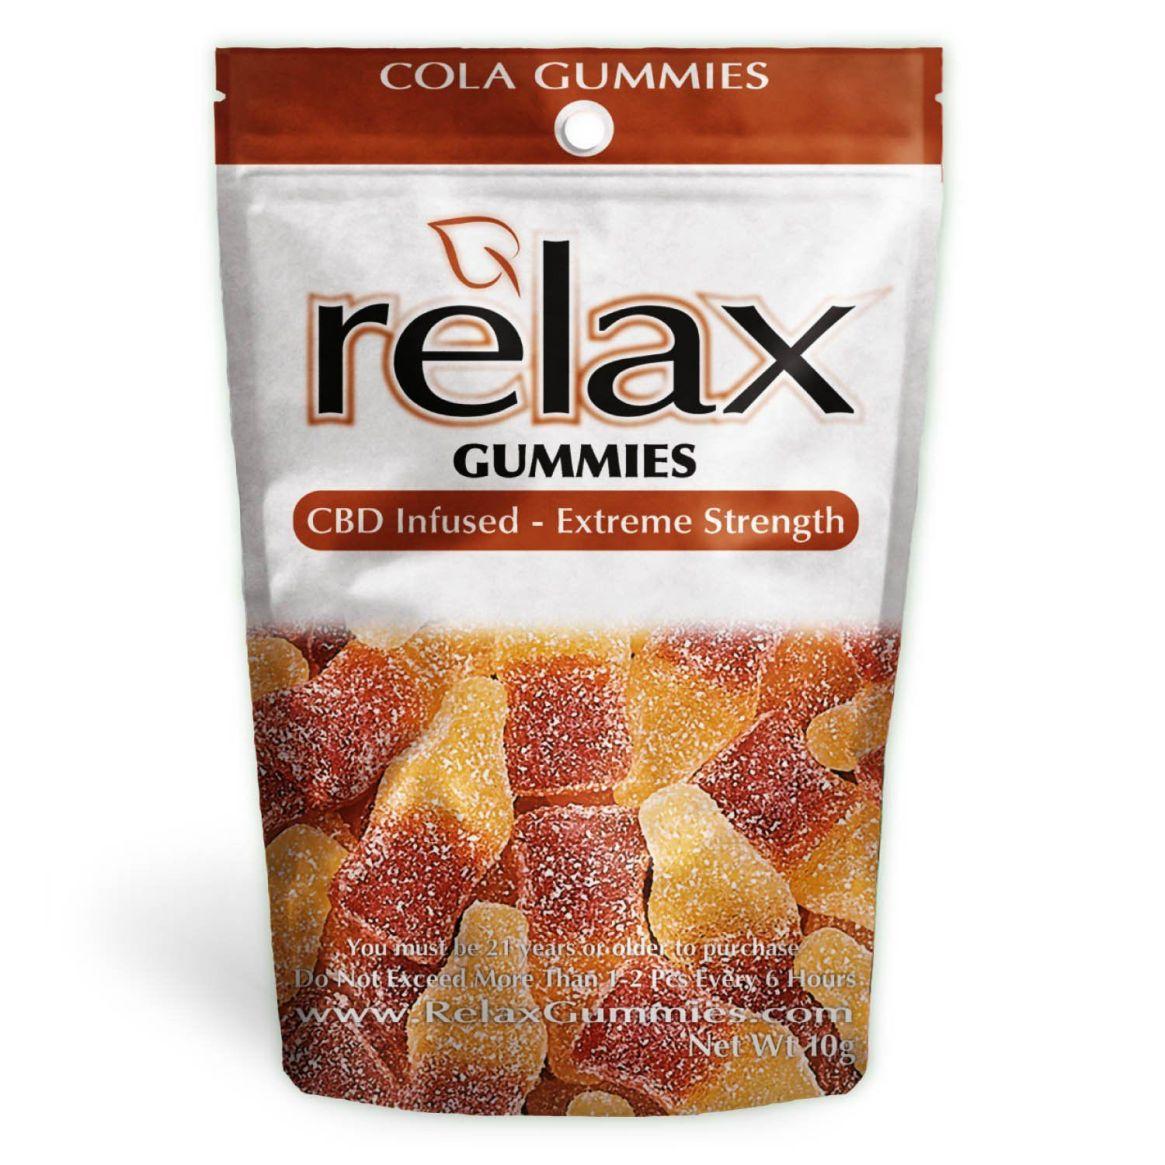 1245457907753_new_cola_gummies